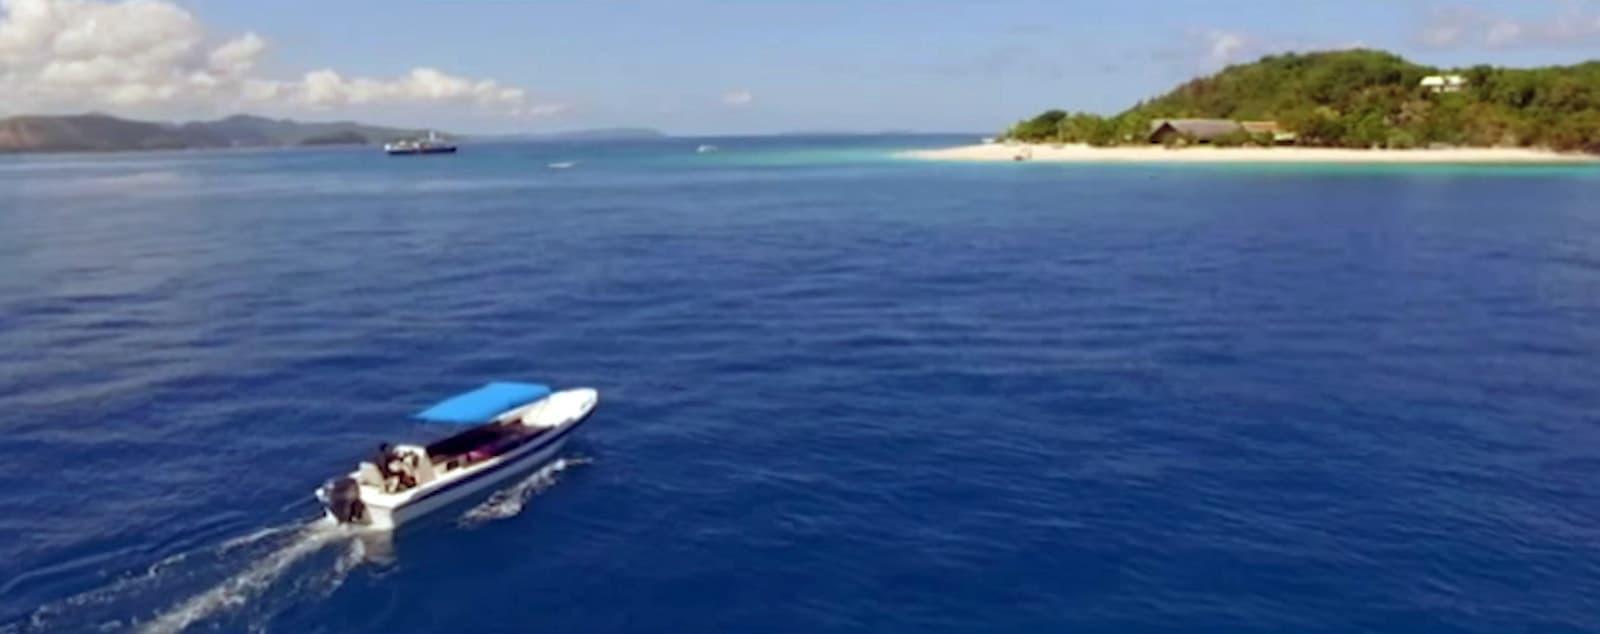 Club Paradise Resort Dimakya Island Coron Palawan